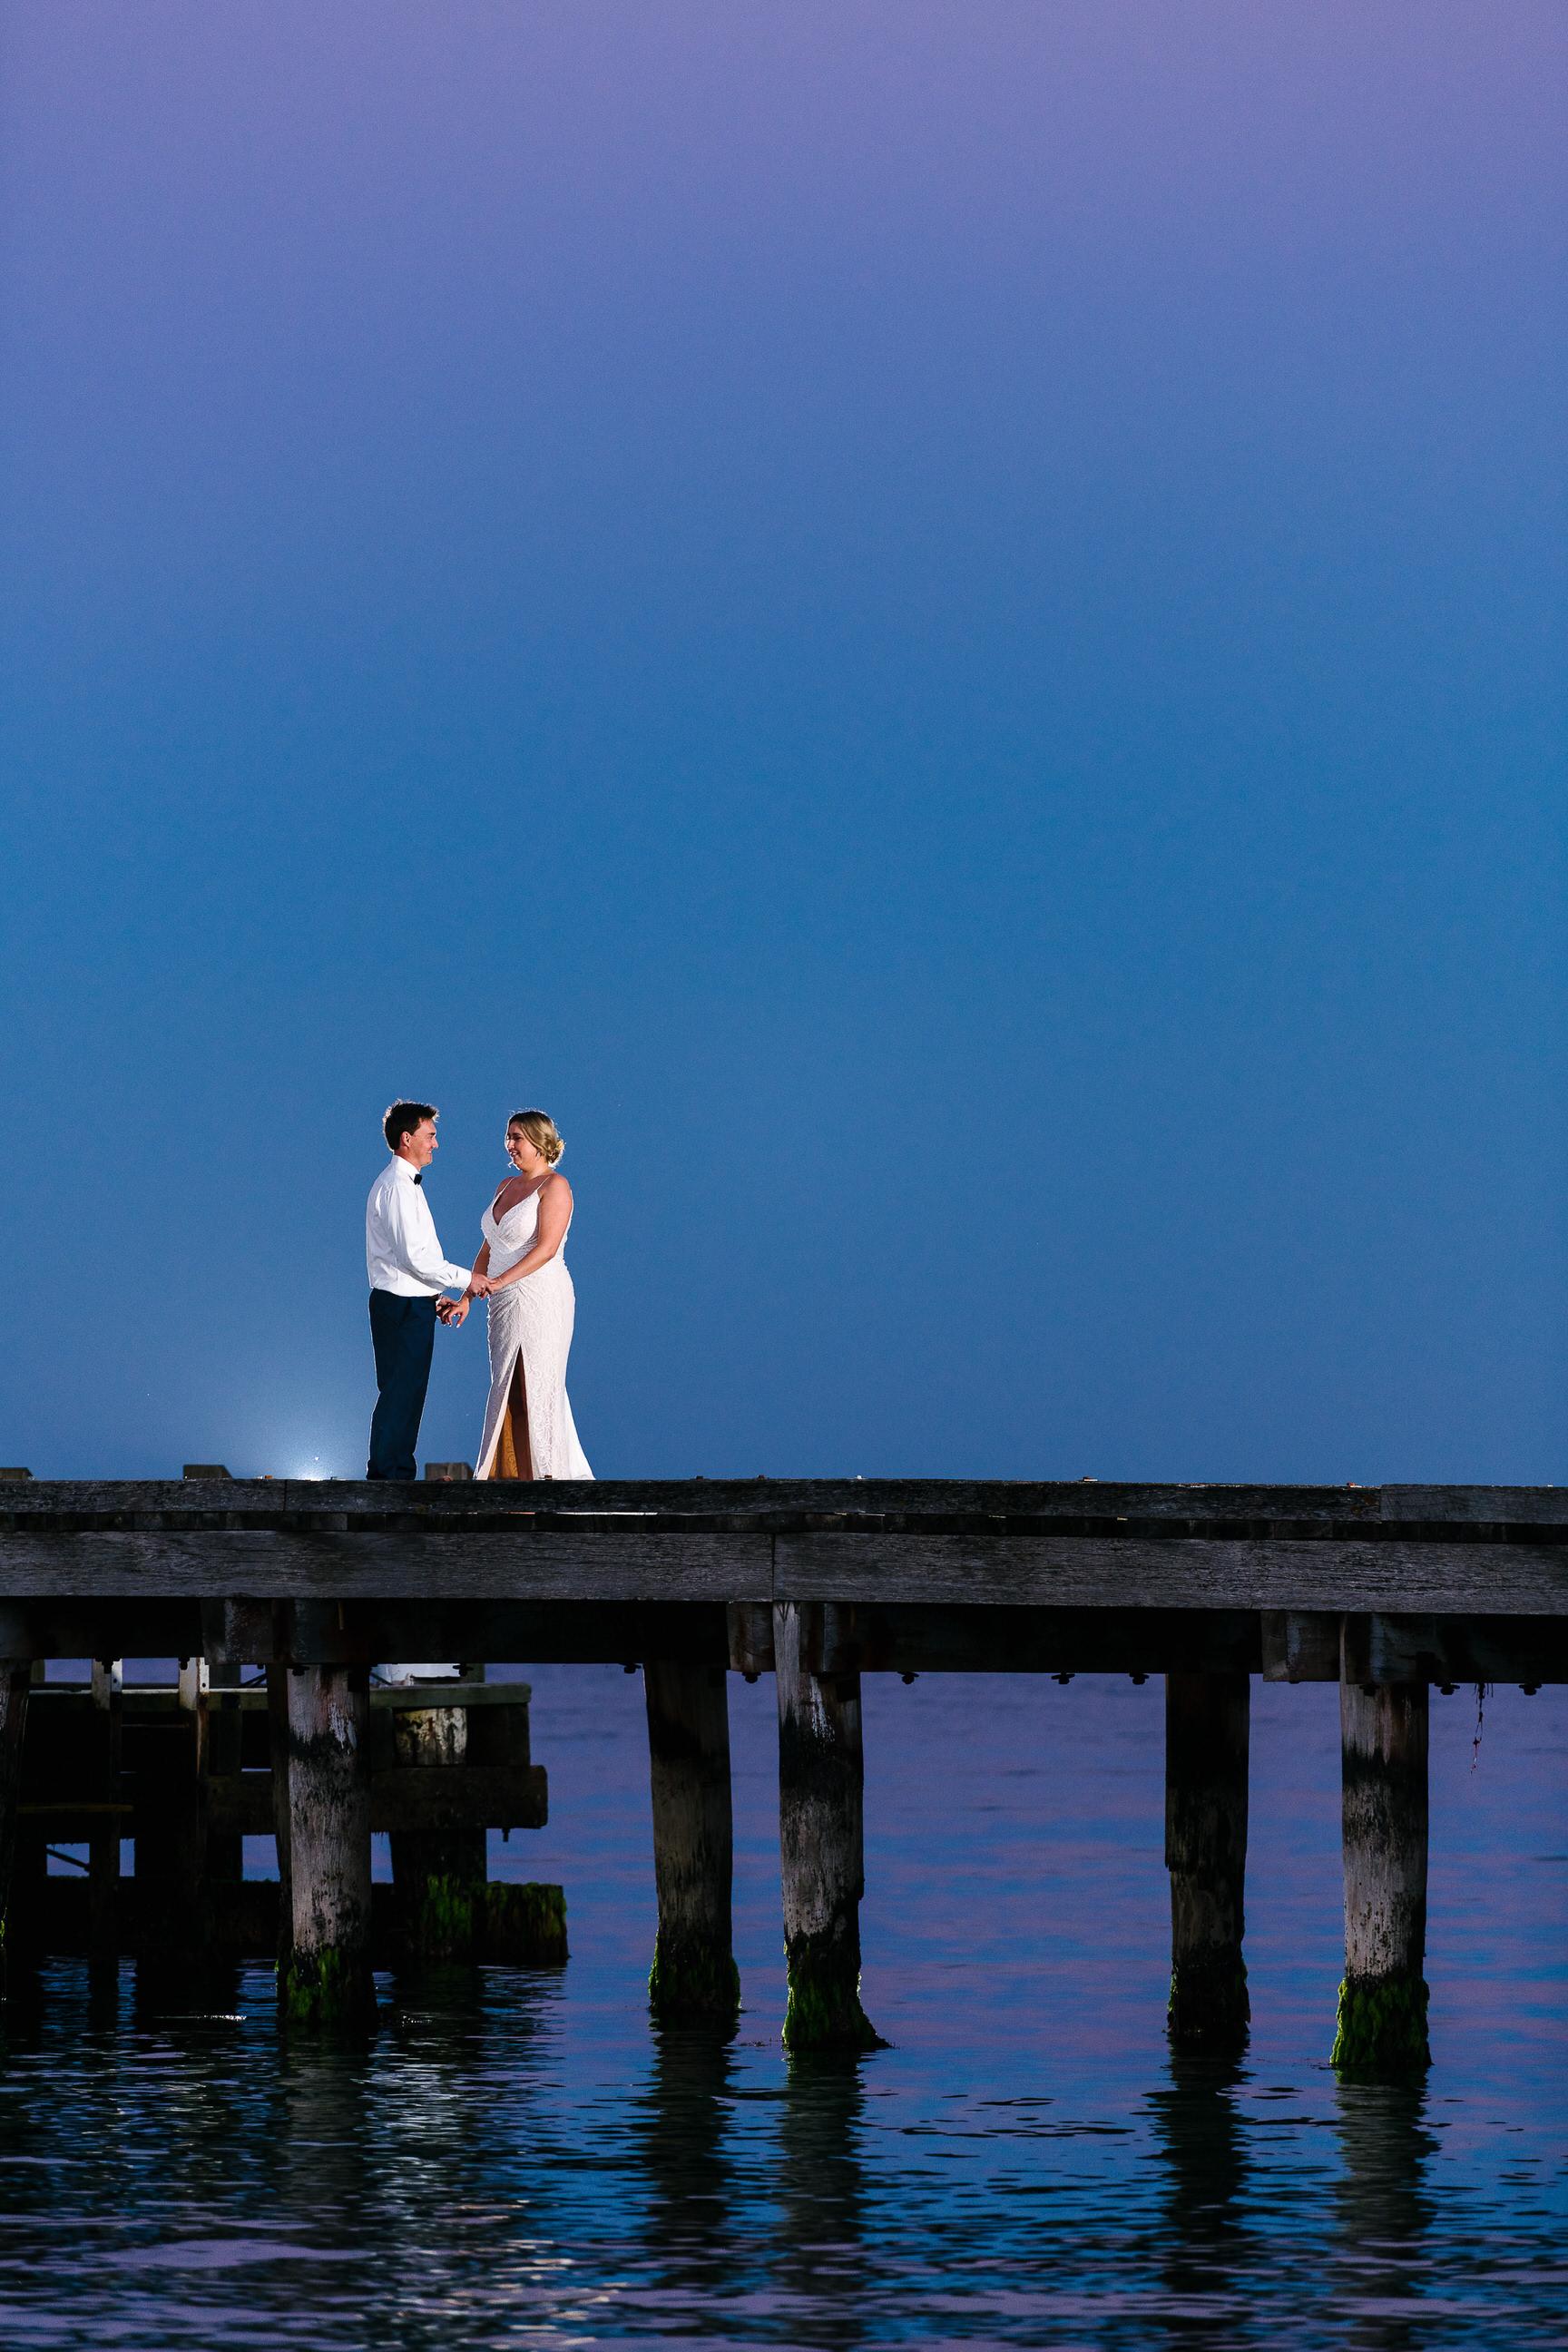 Justin_And_Jim_Photography_Portsea_Pub_Wedding83.JPG